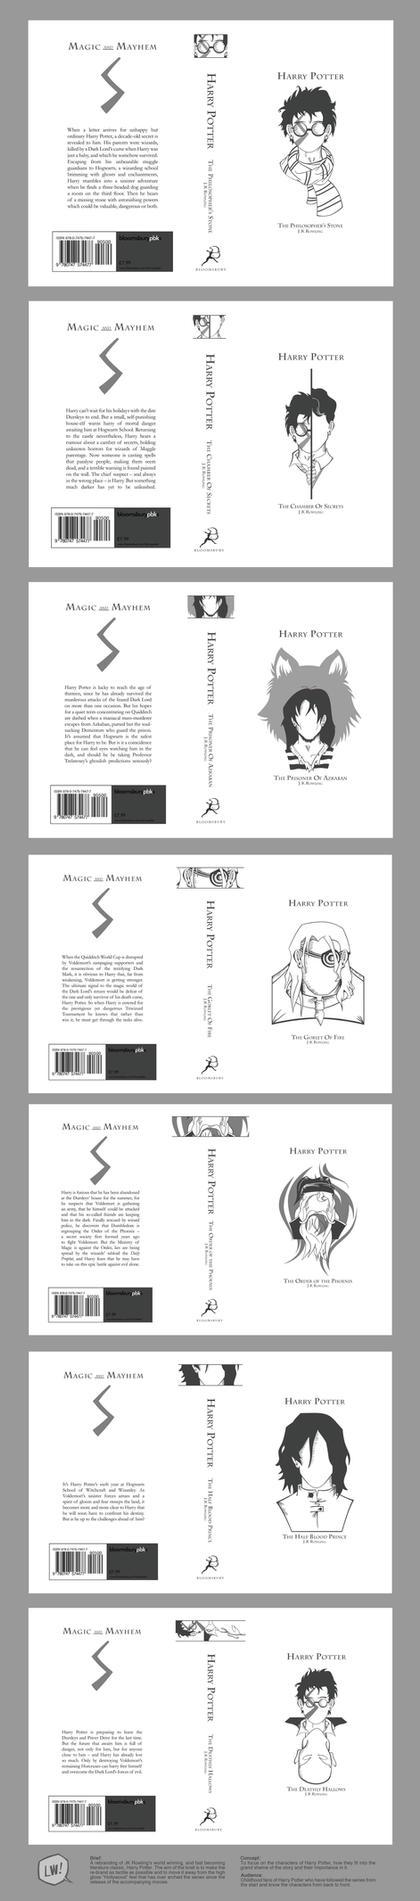 Harry Potter - Book Covers by Bluemutantfreak